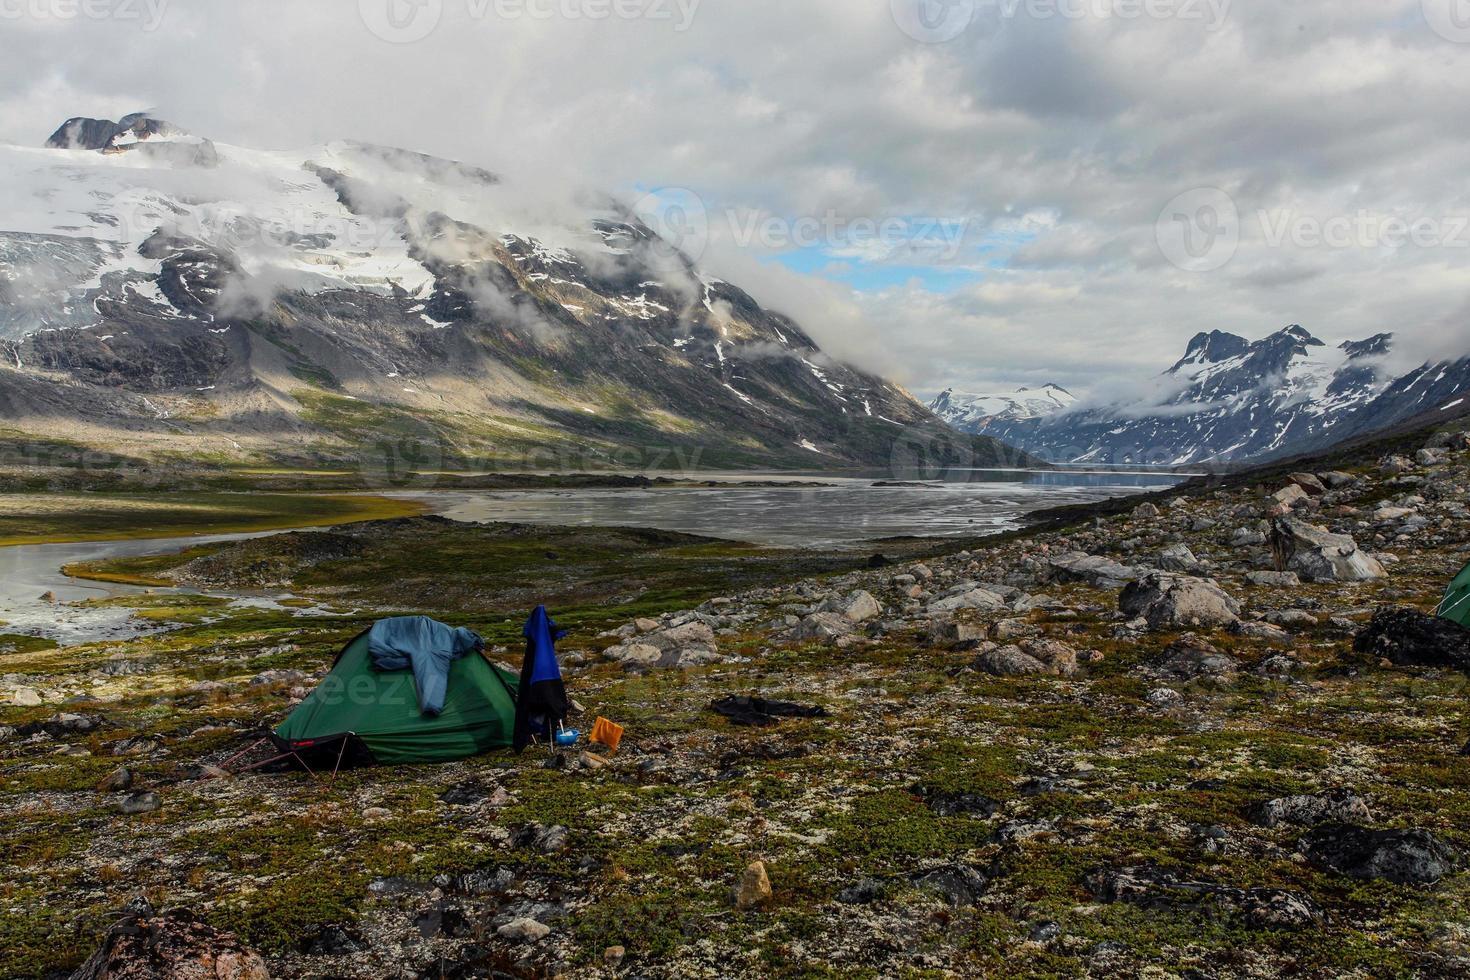 Camping in Grönland foto